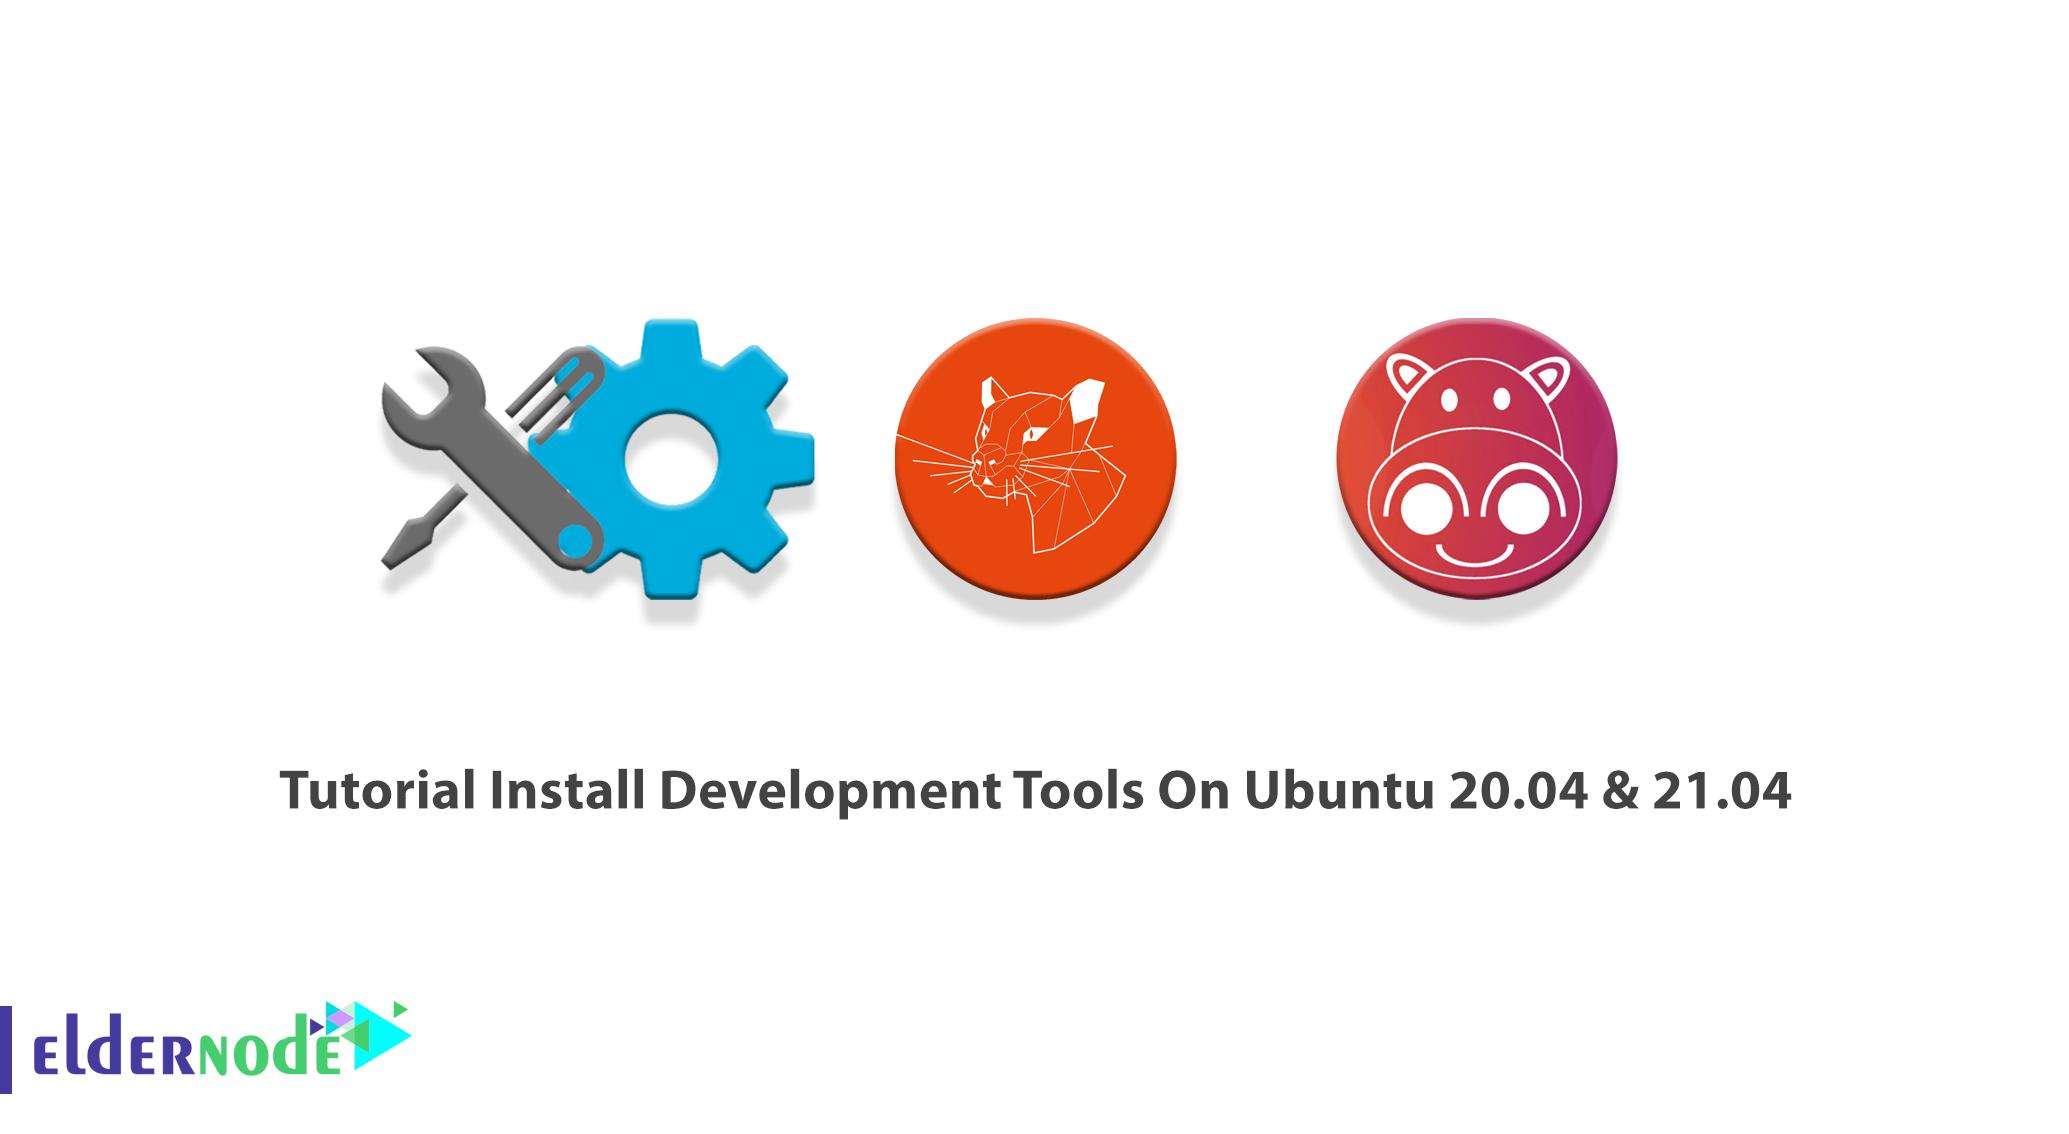 Tutorial Install Development Tools On Ubuntu 20.04 & 21.04